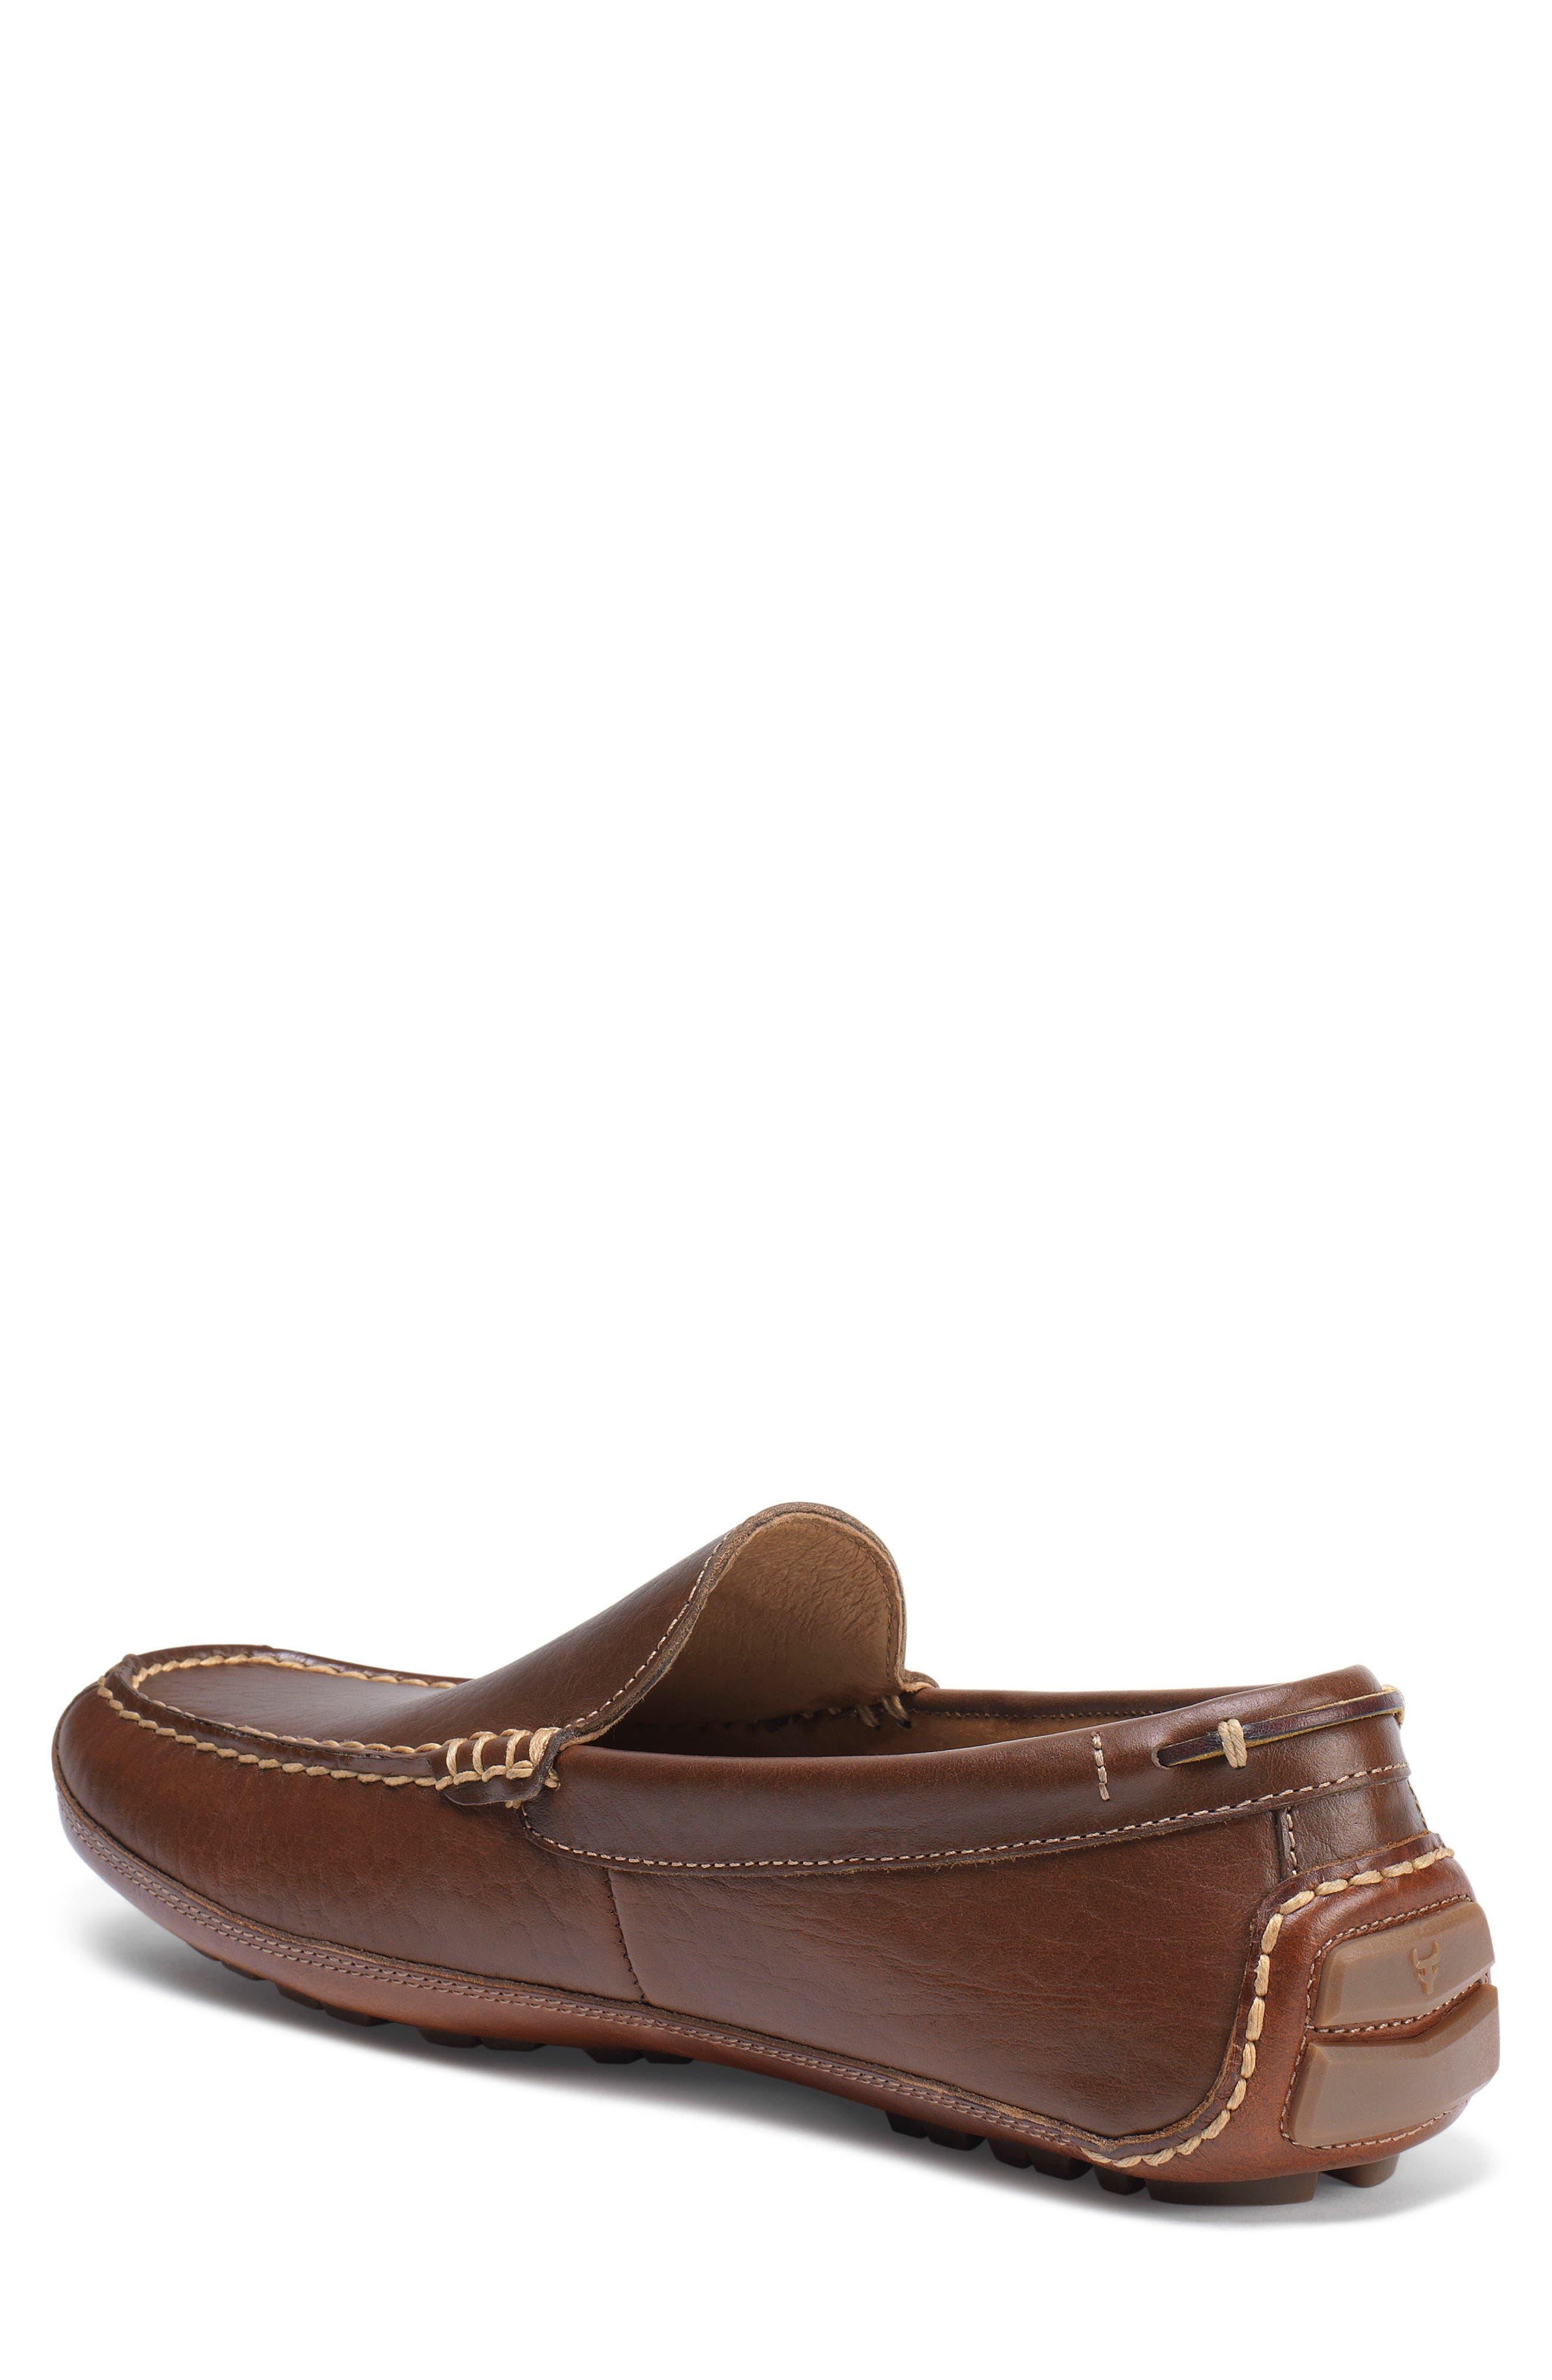 Dean Driving Shoe,                             Alternate thumbnail 2, color,                             Saddle Tan Leather